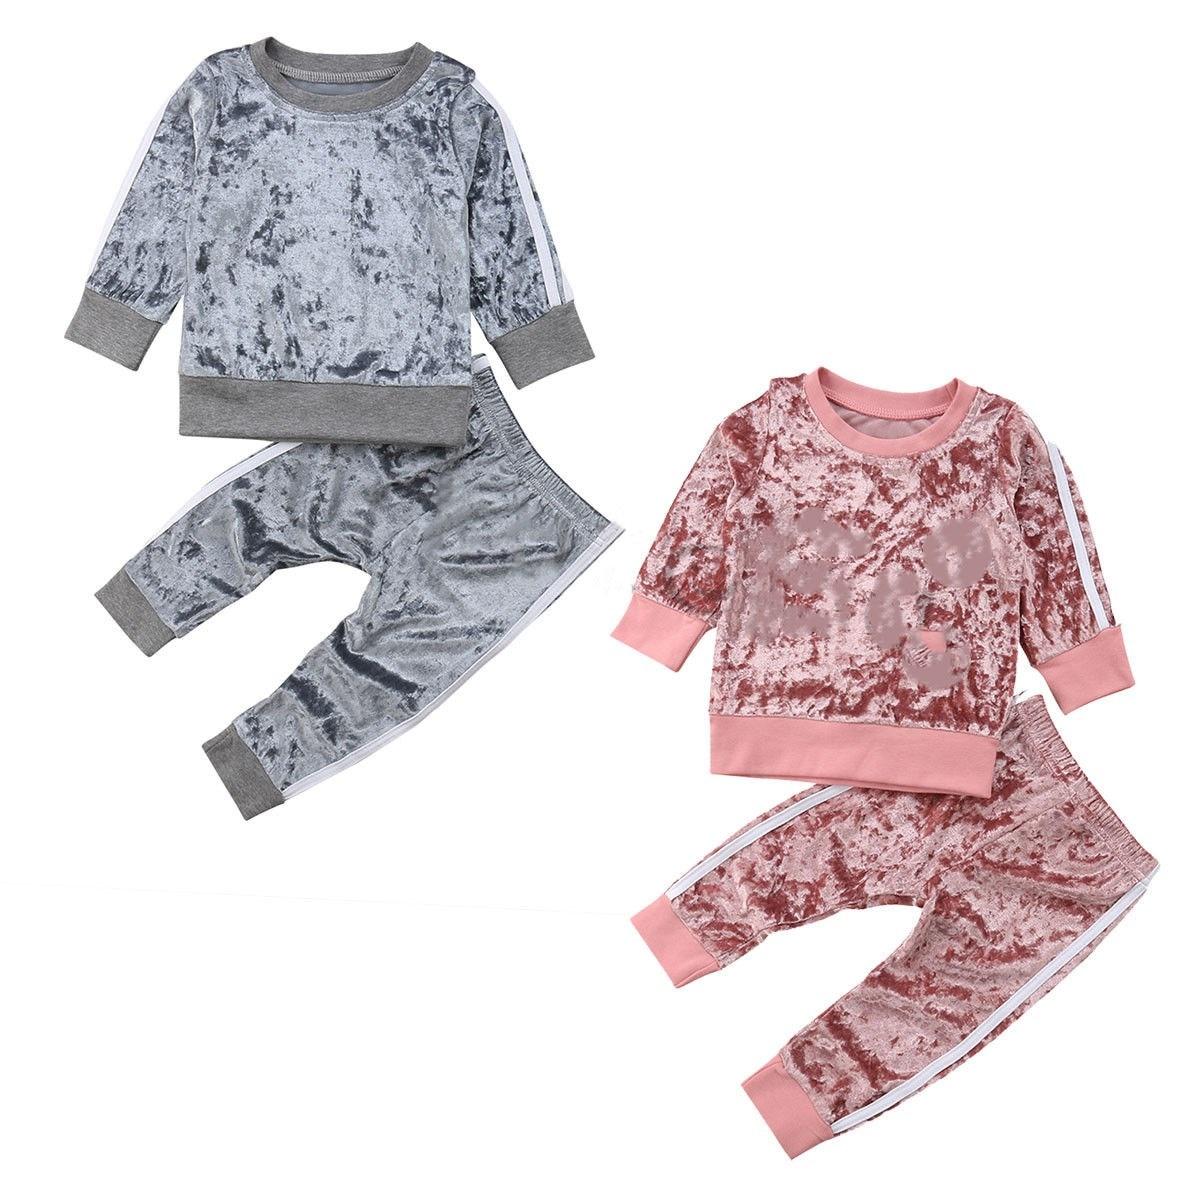 Kids Baby Boys Girls Sports Clothes Stripe Velvet Suit Autumn Spring Outfits Set